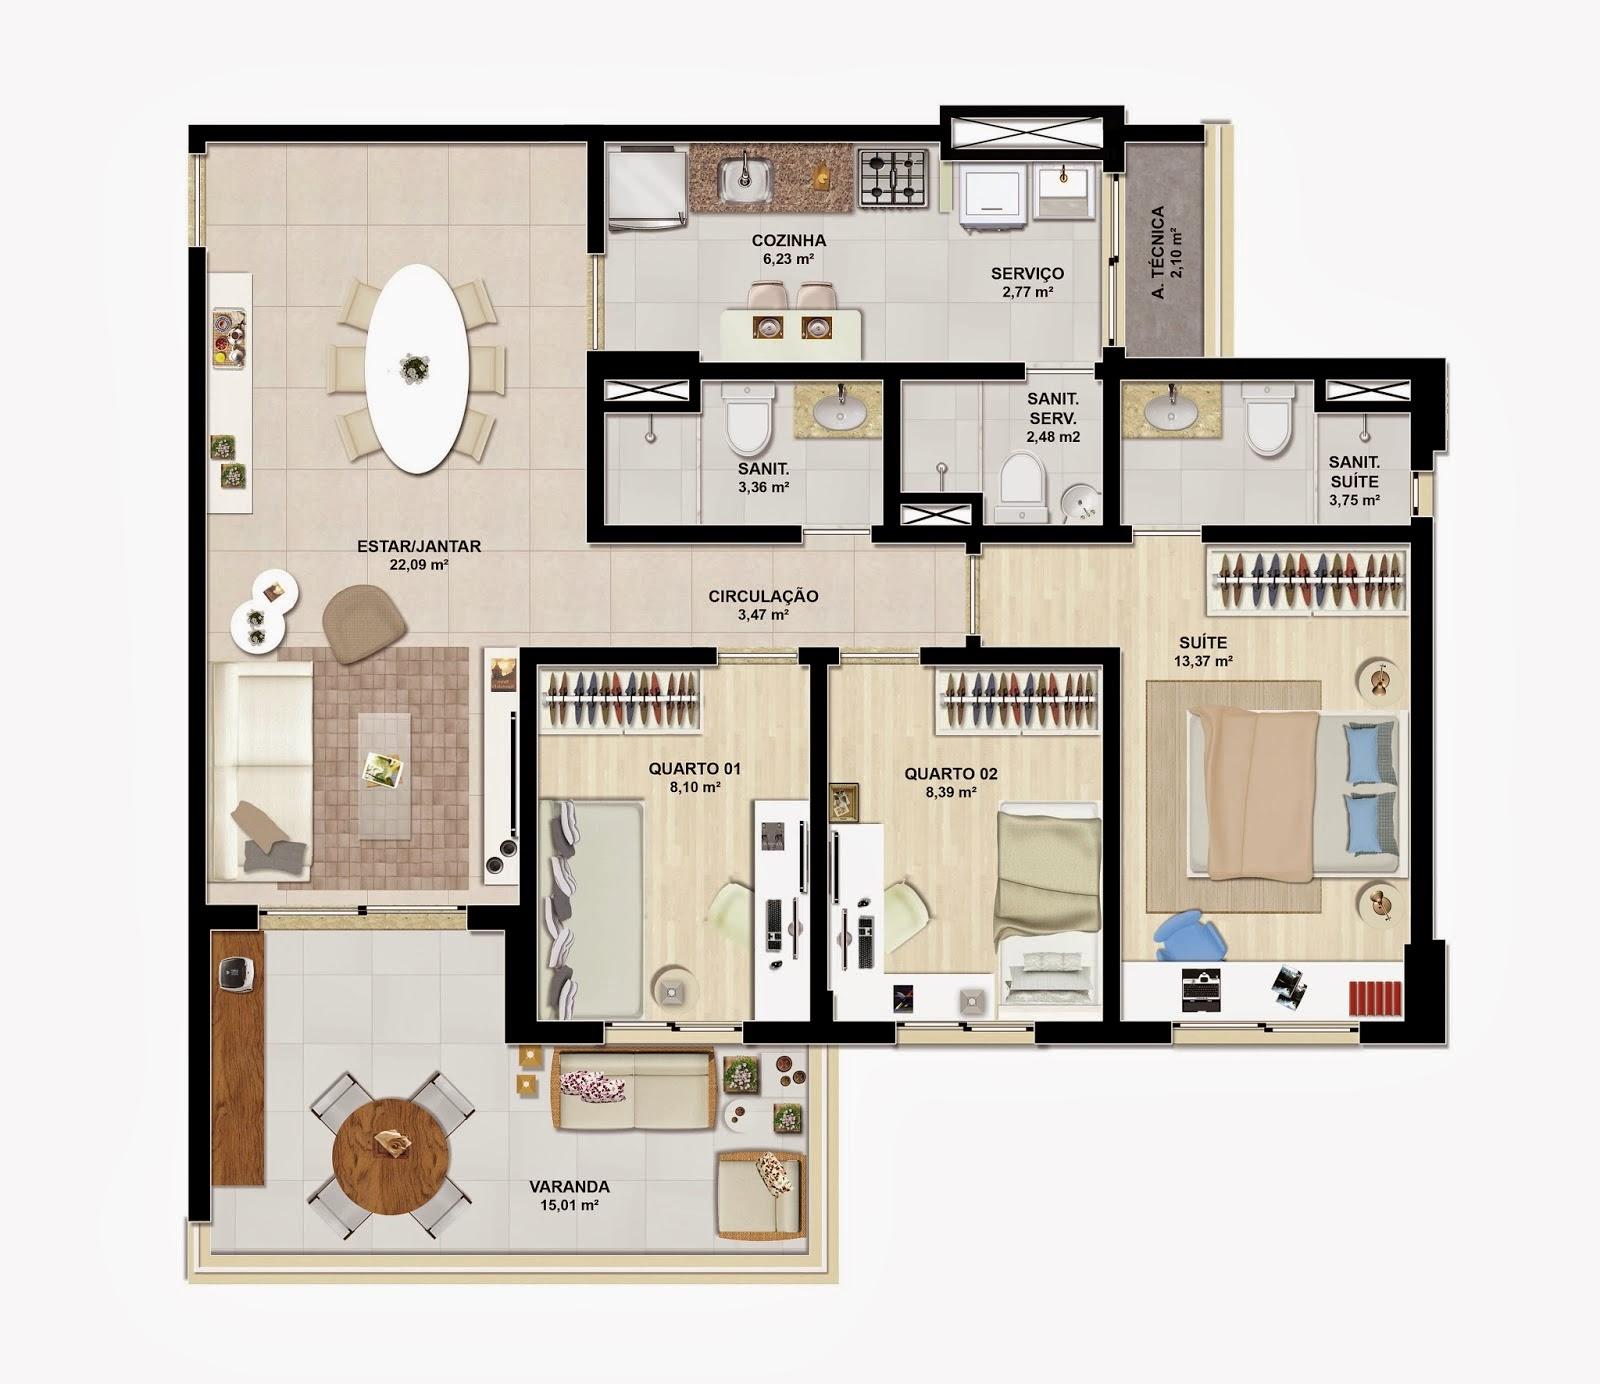 verano residencial - tipo 91m²